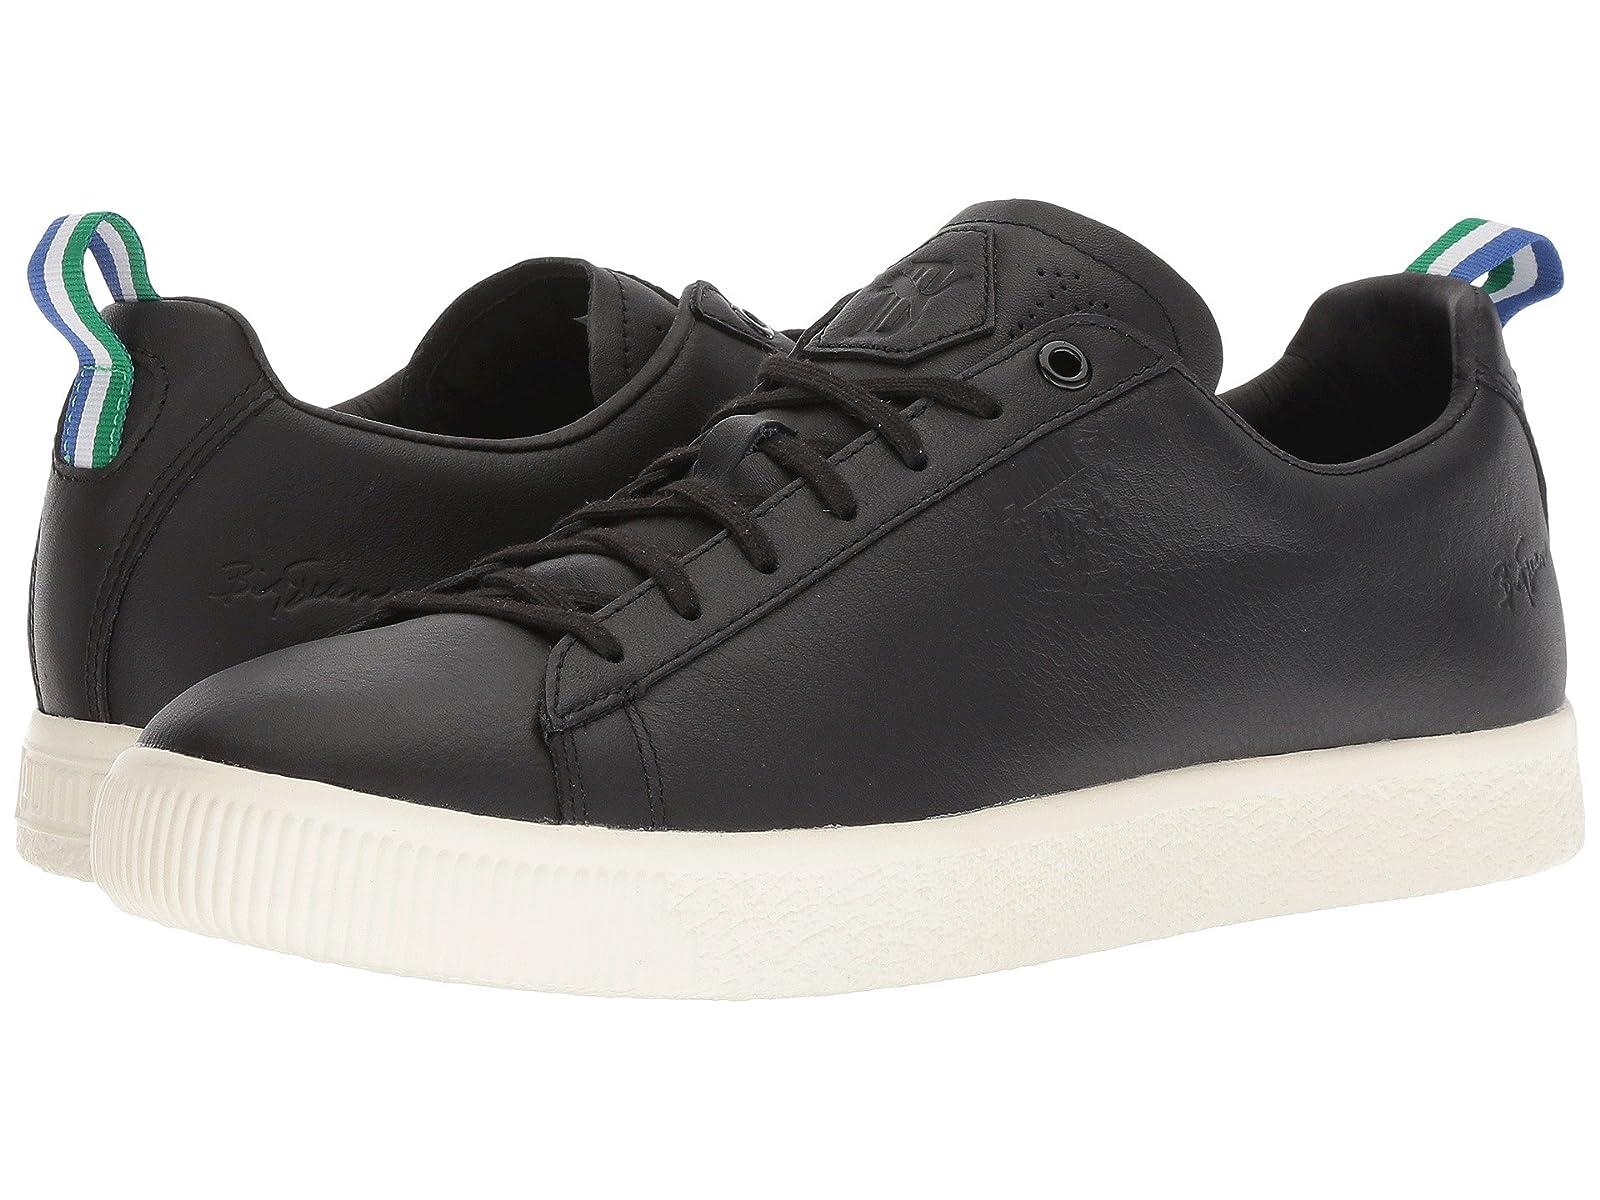 PUMA Clyde Big SeanAtmospheric grades have affordable shoes